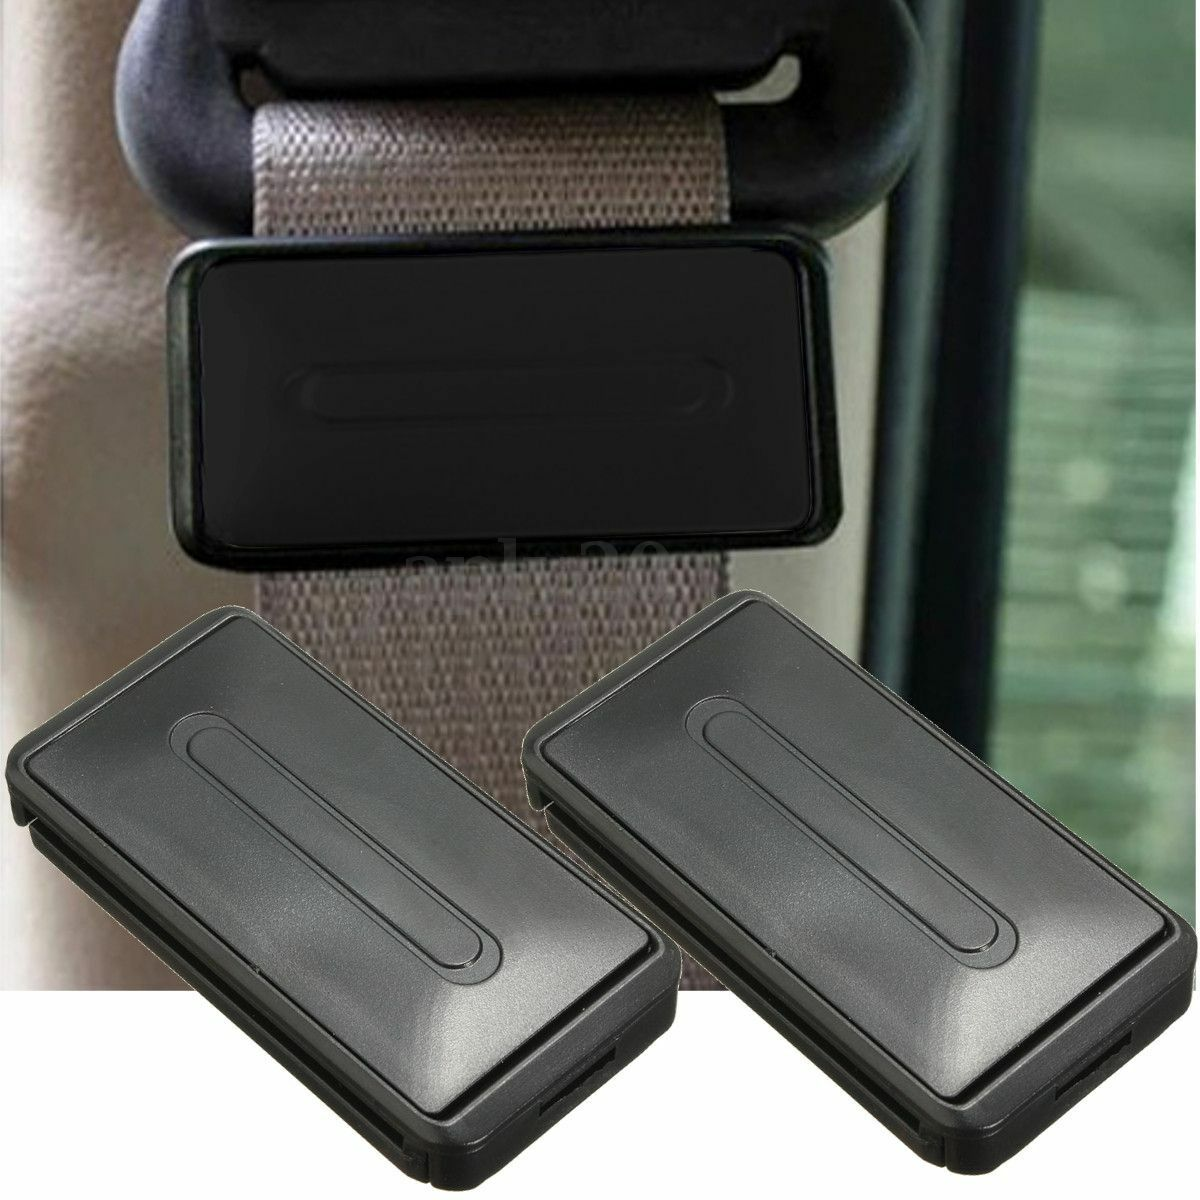 toyota rav4 forums seat belt too tight. Black Bedroom Furniture Sets. Home Design Ideas